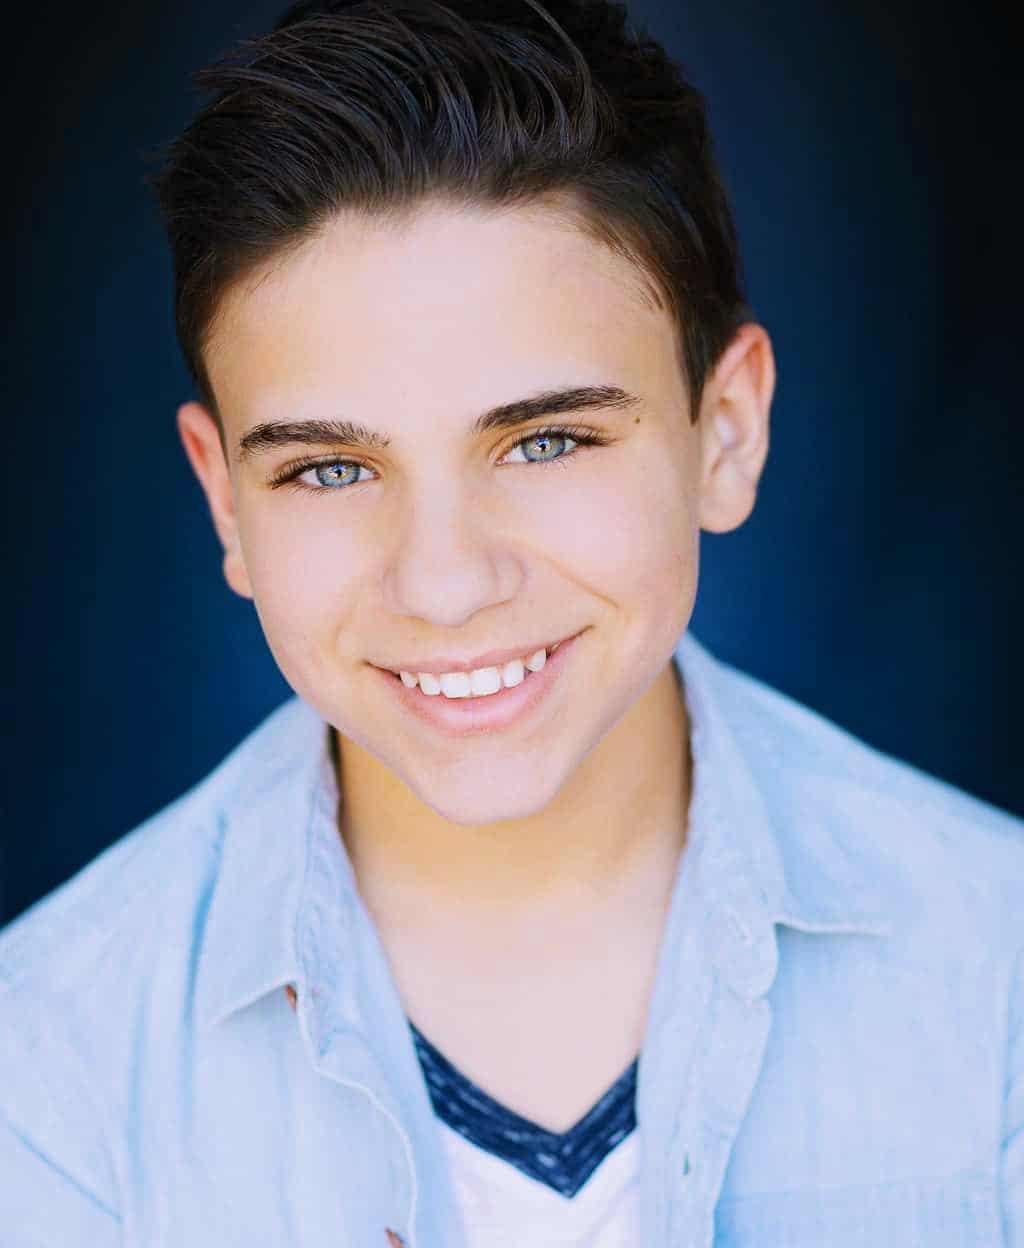 Nicholas Ryan Hernandez Biography, Age, Net Worth, Height, Parents, Wiki